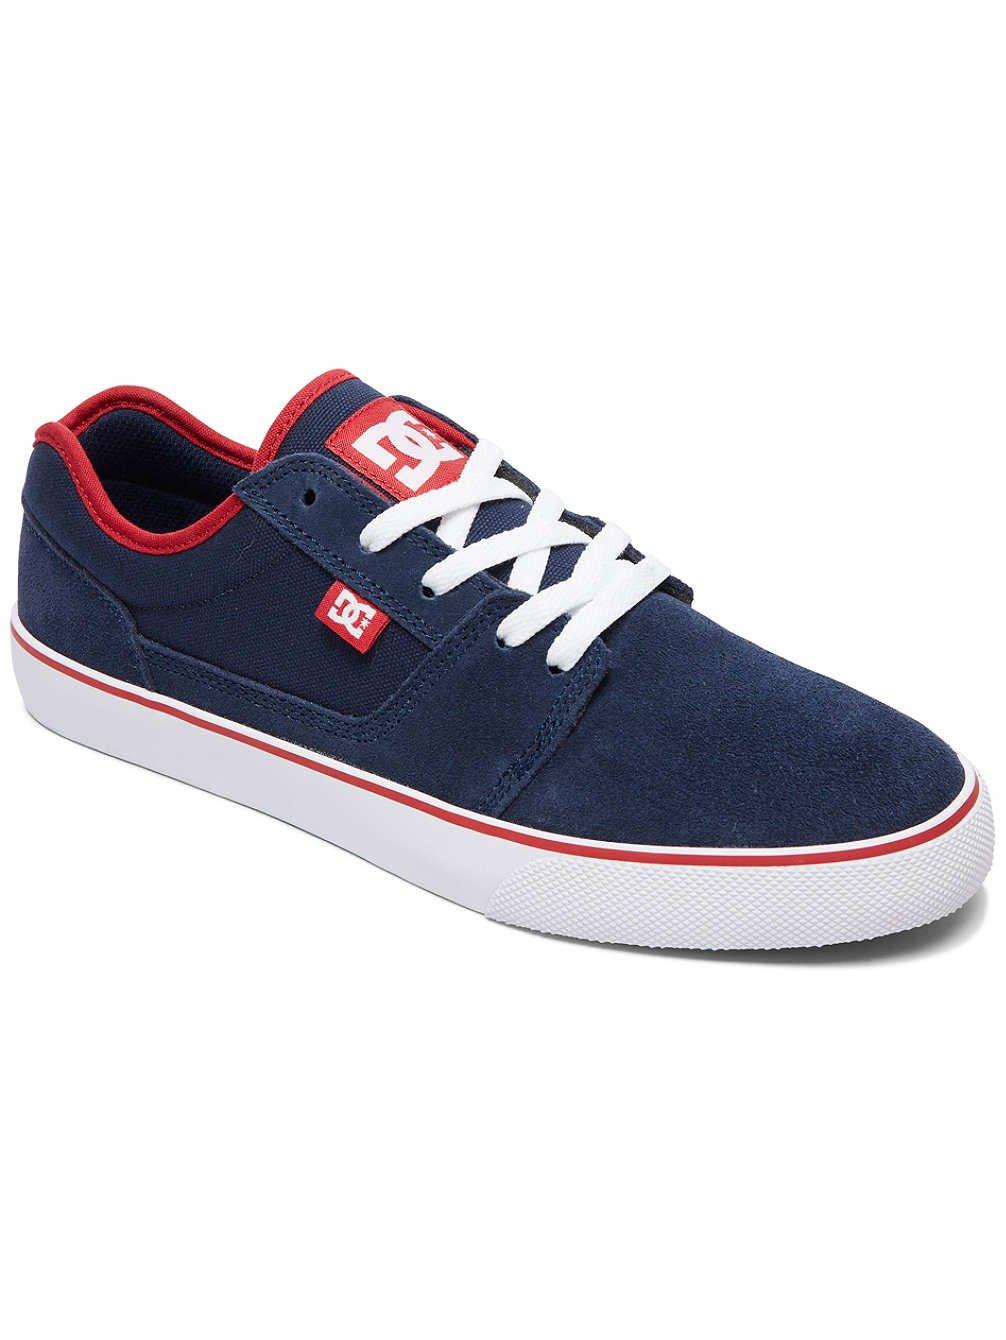 DC TONIK Unisex-Erwachsene Sneakers  40.5 EU|Navy/Red